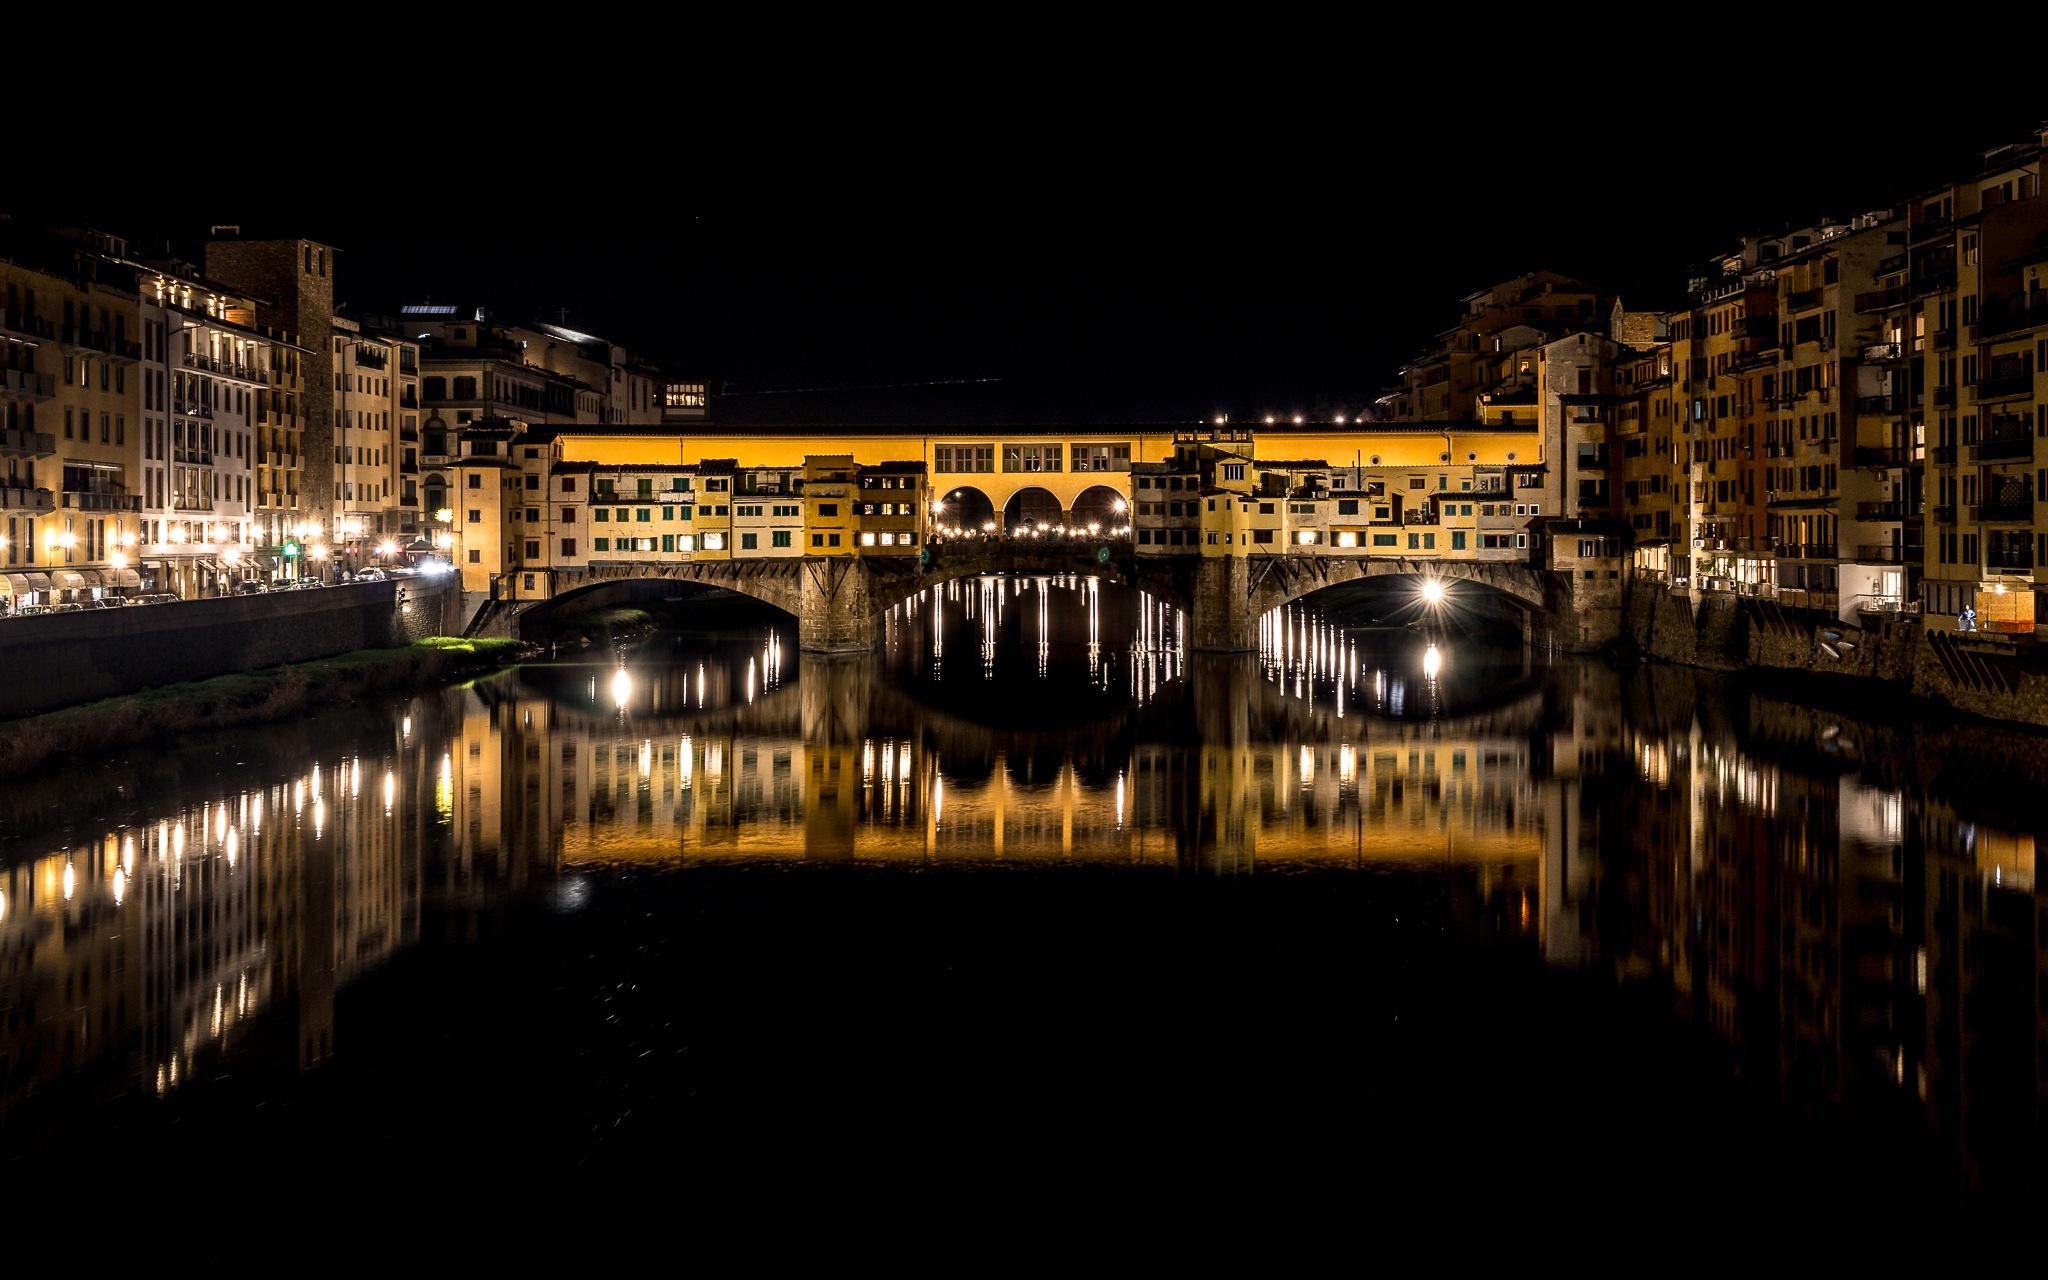 Ponte Vecchio Nights by Thomas Cotton